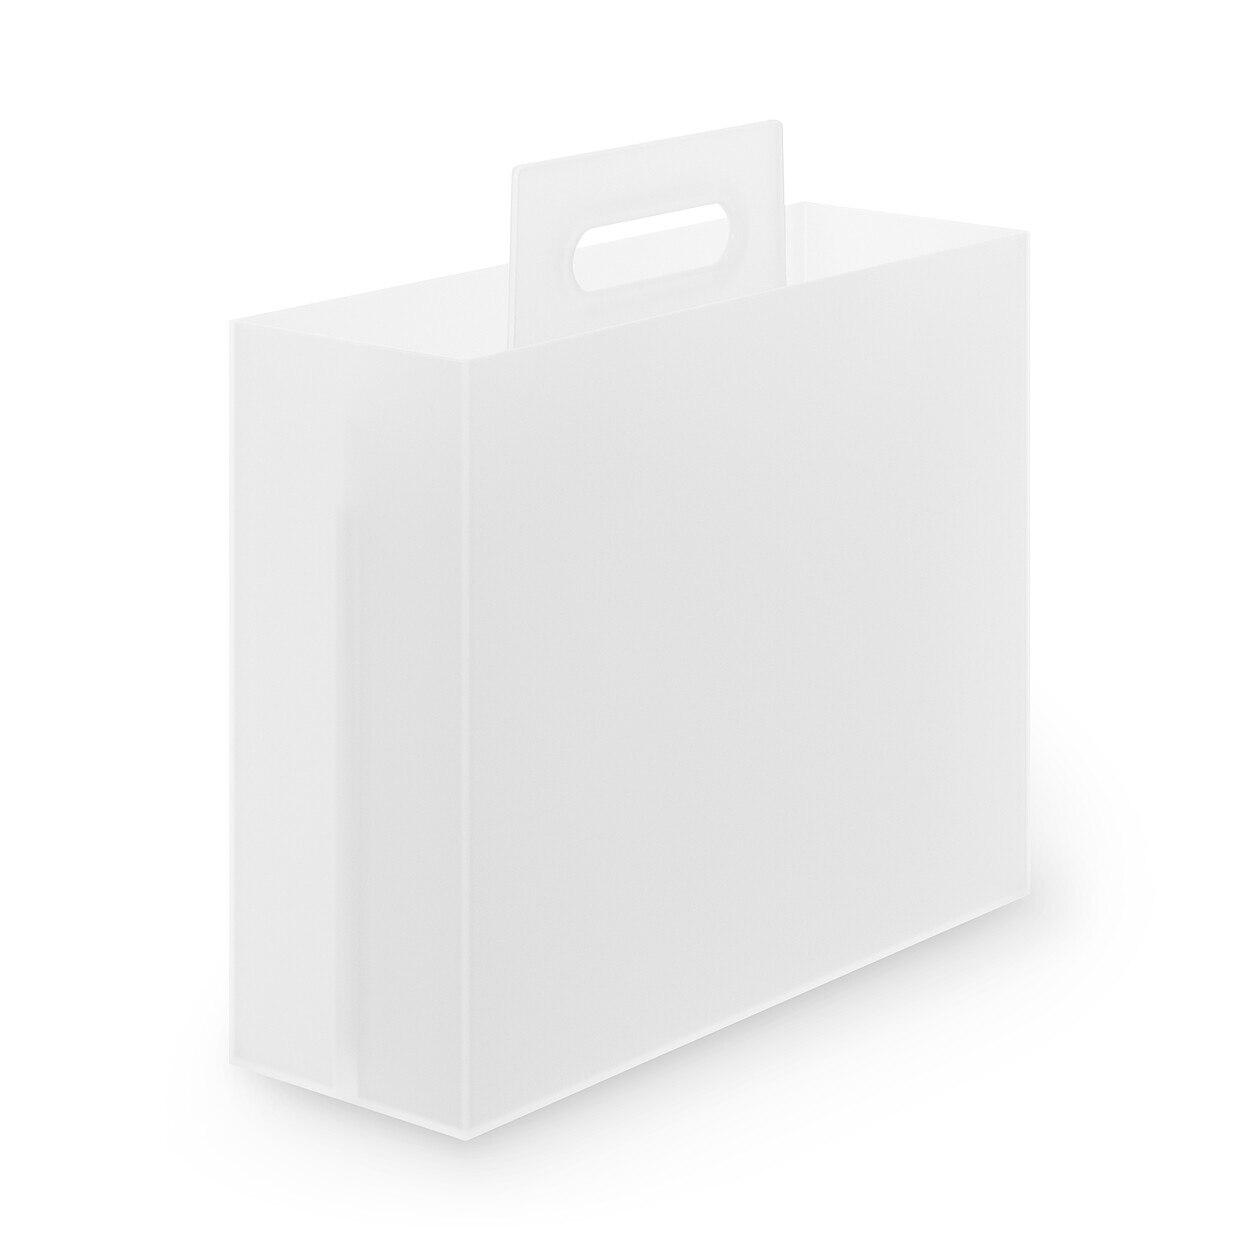 PP File Box with Handle | 無印良品 MUJI